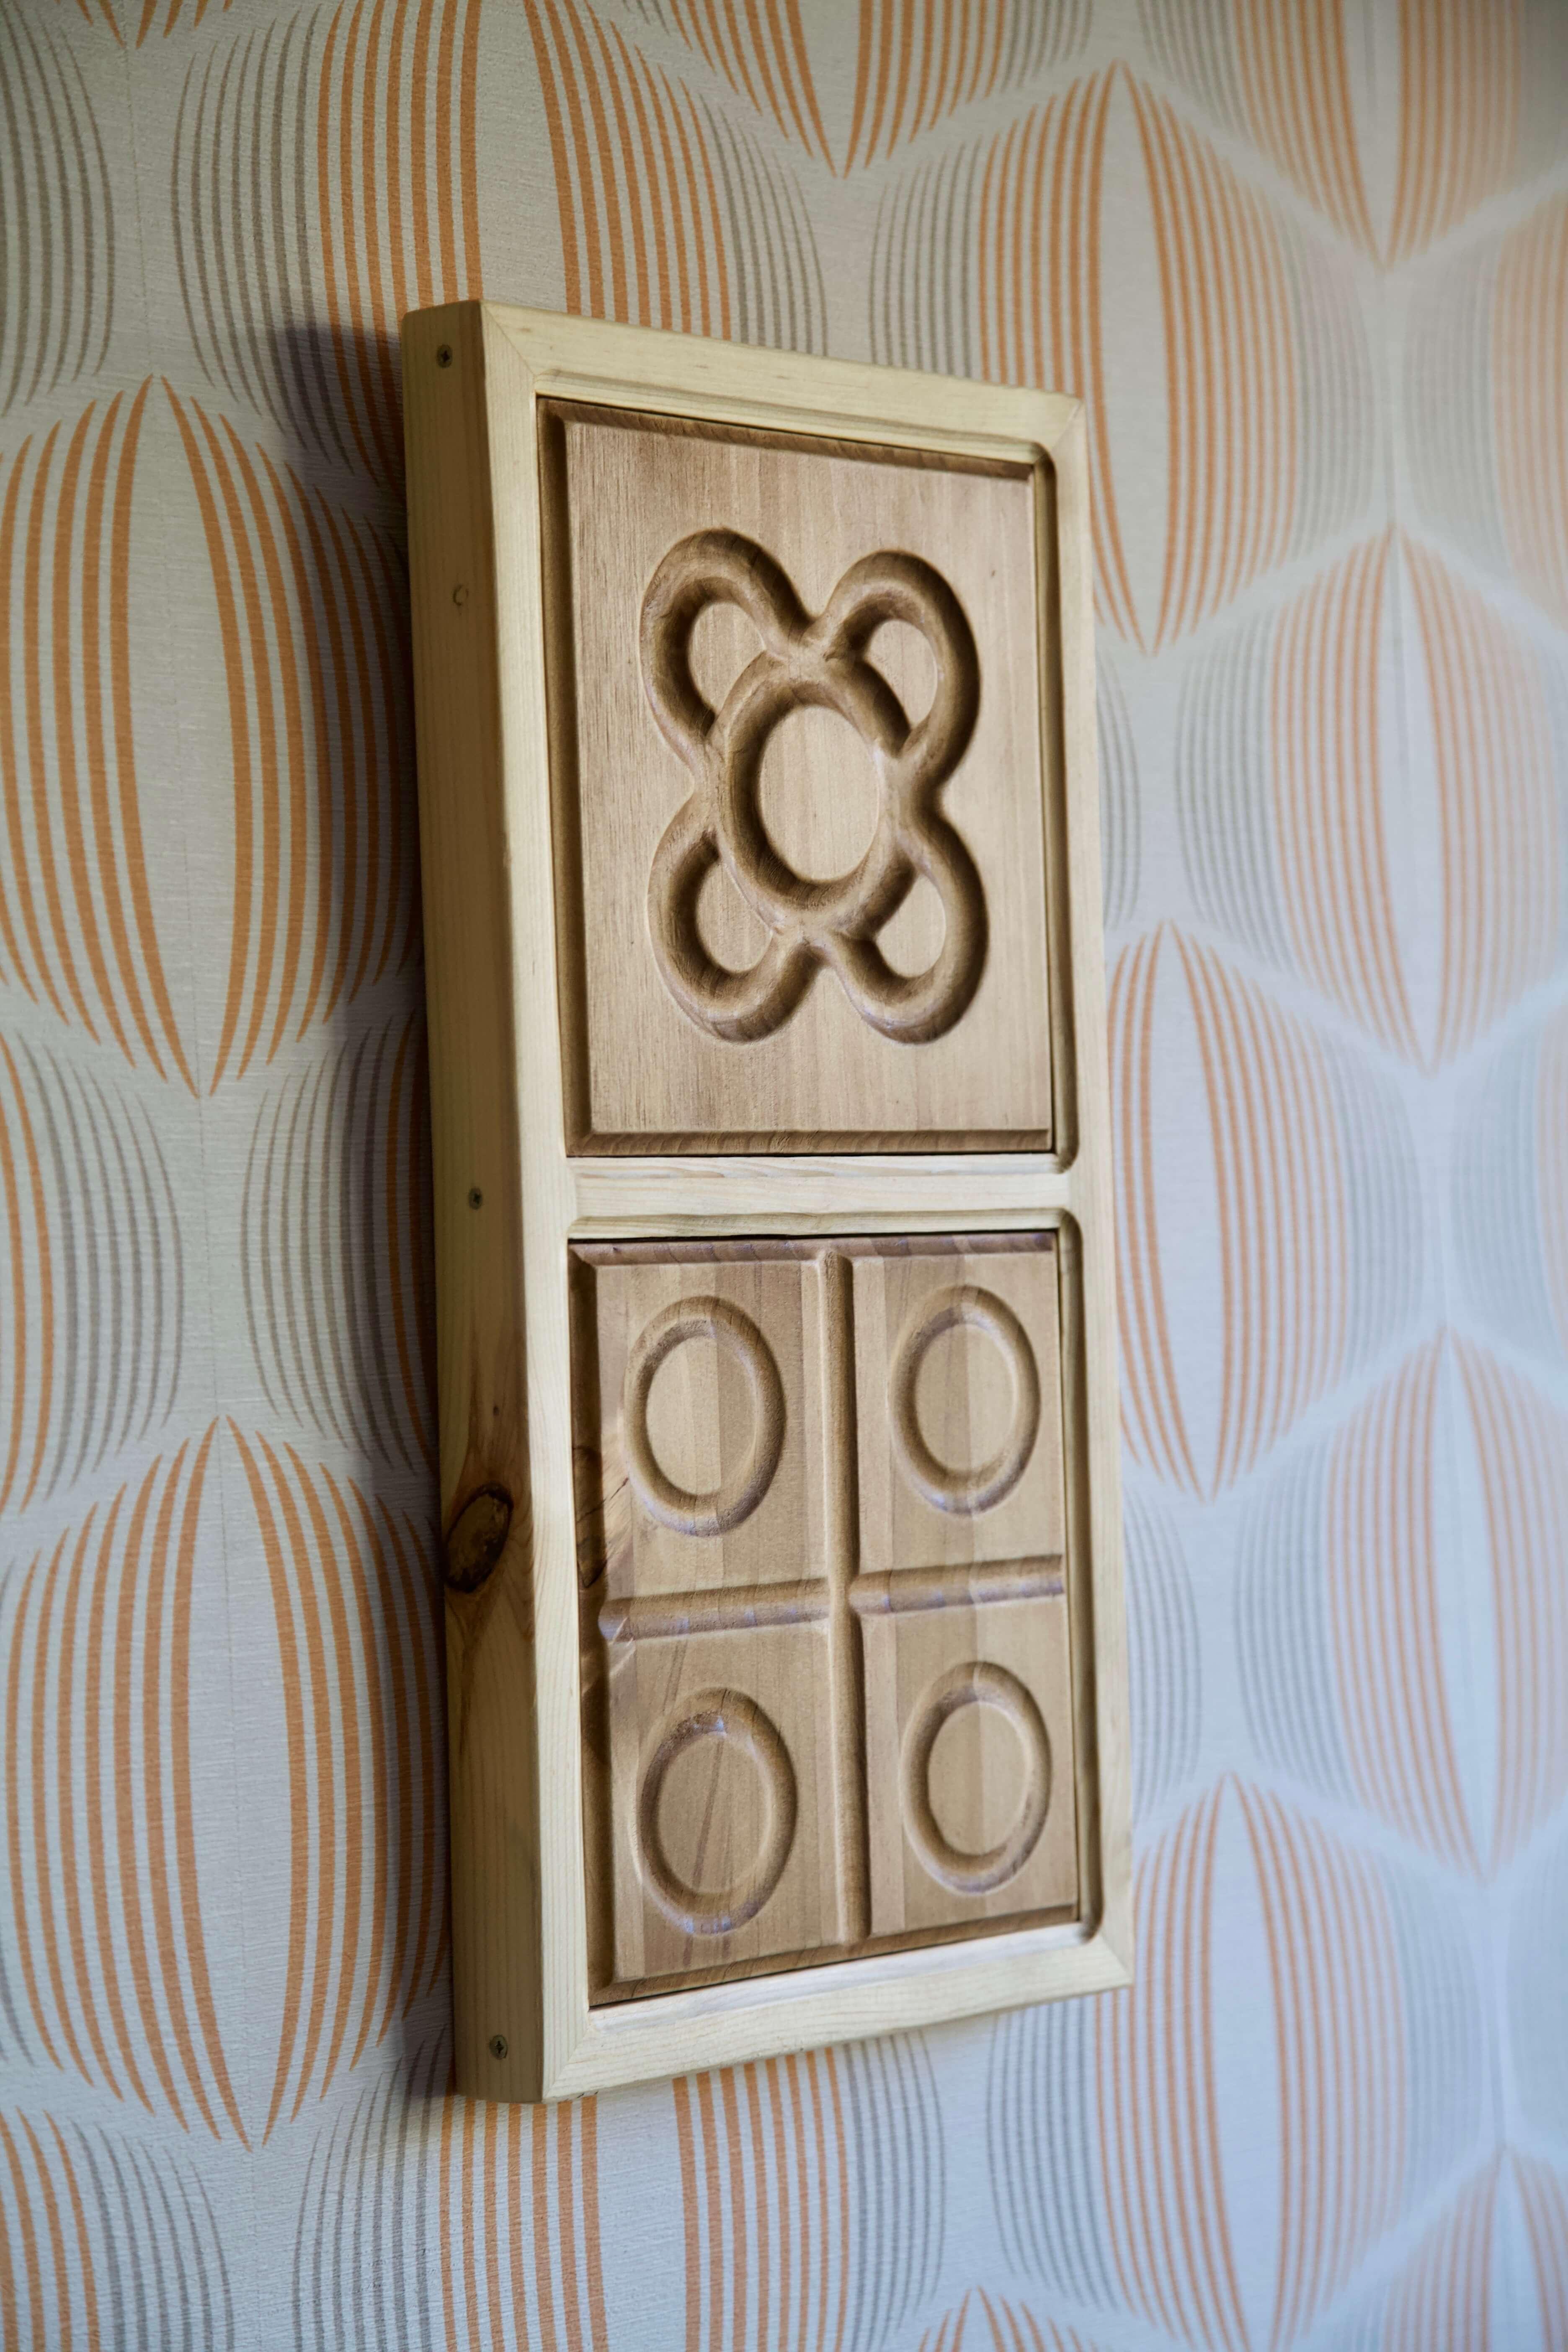 imagen lateral izquierda del marco con panot flor de barcelona